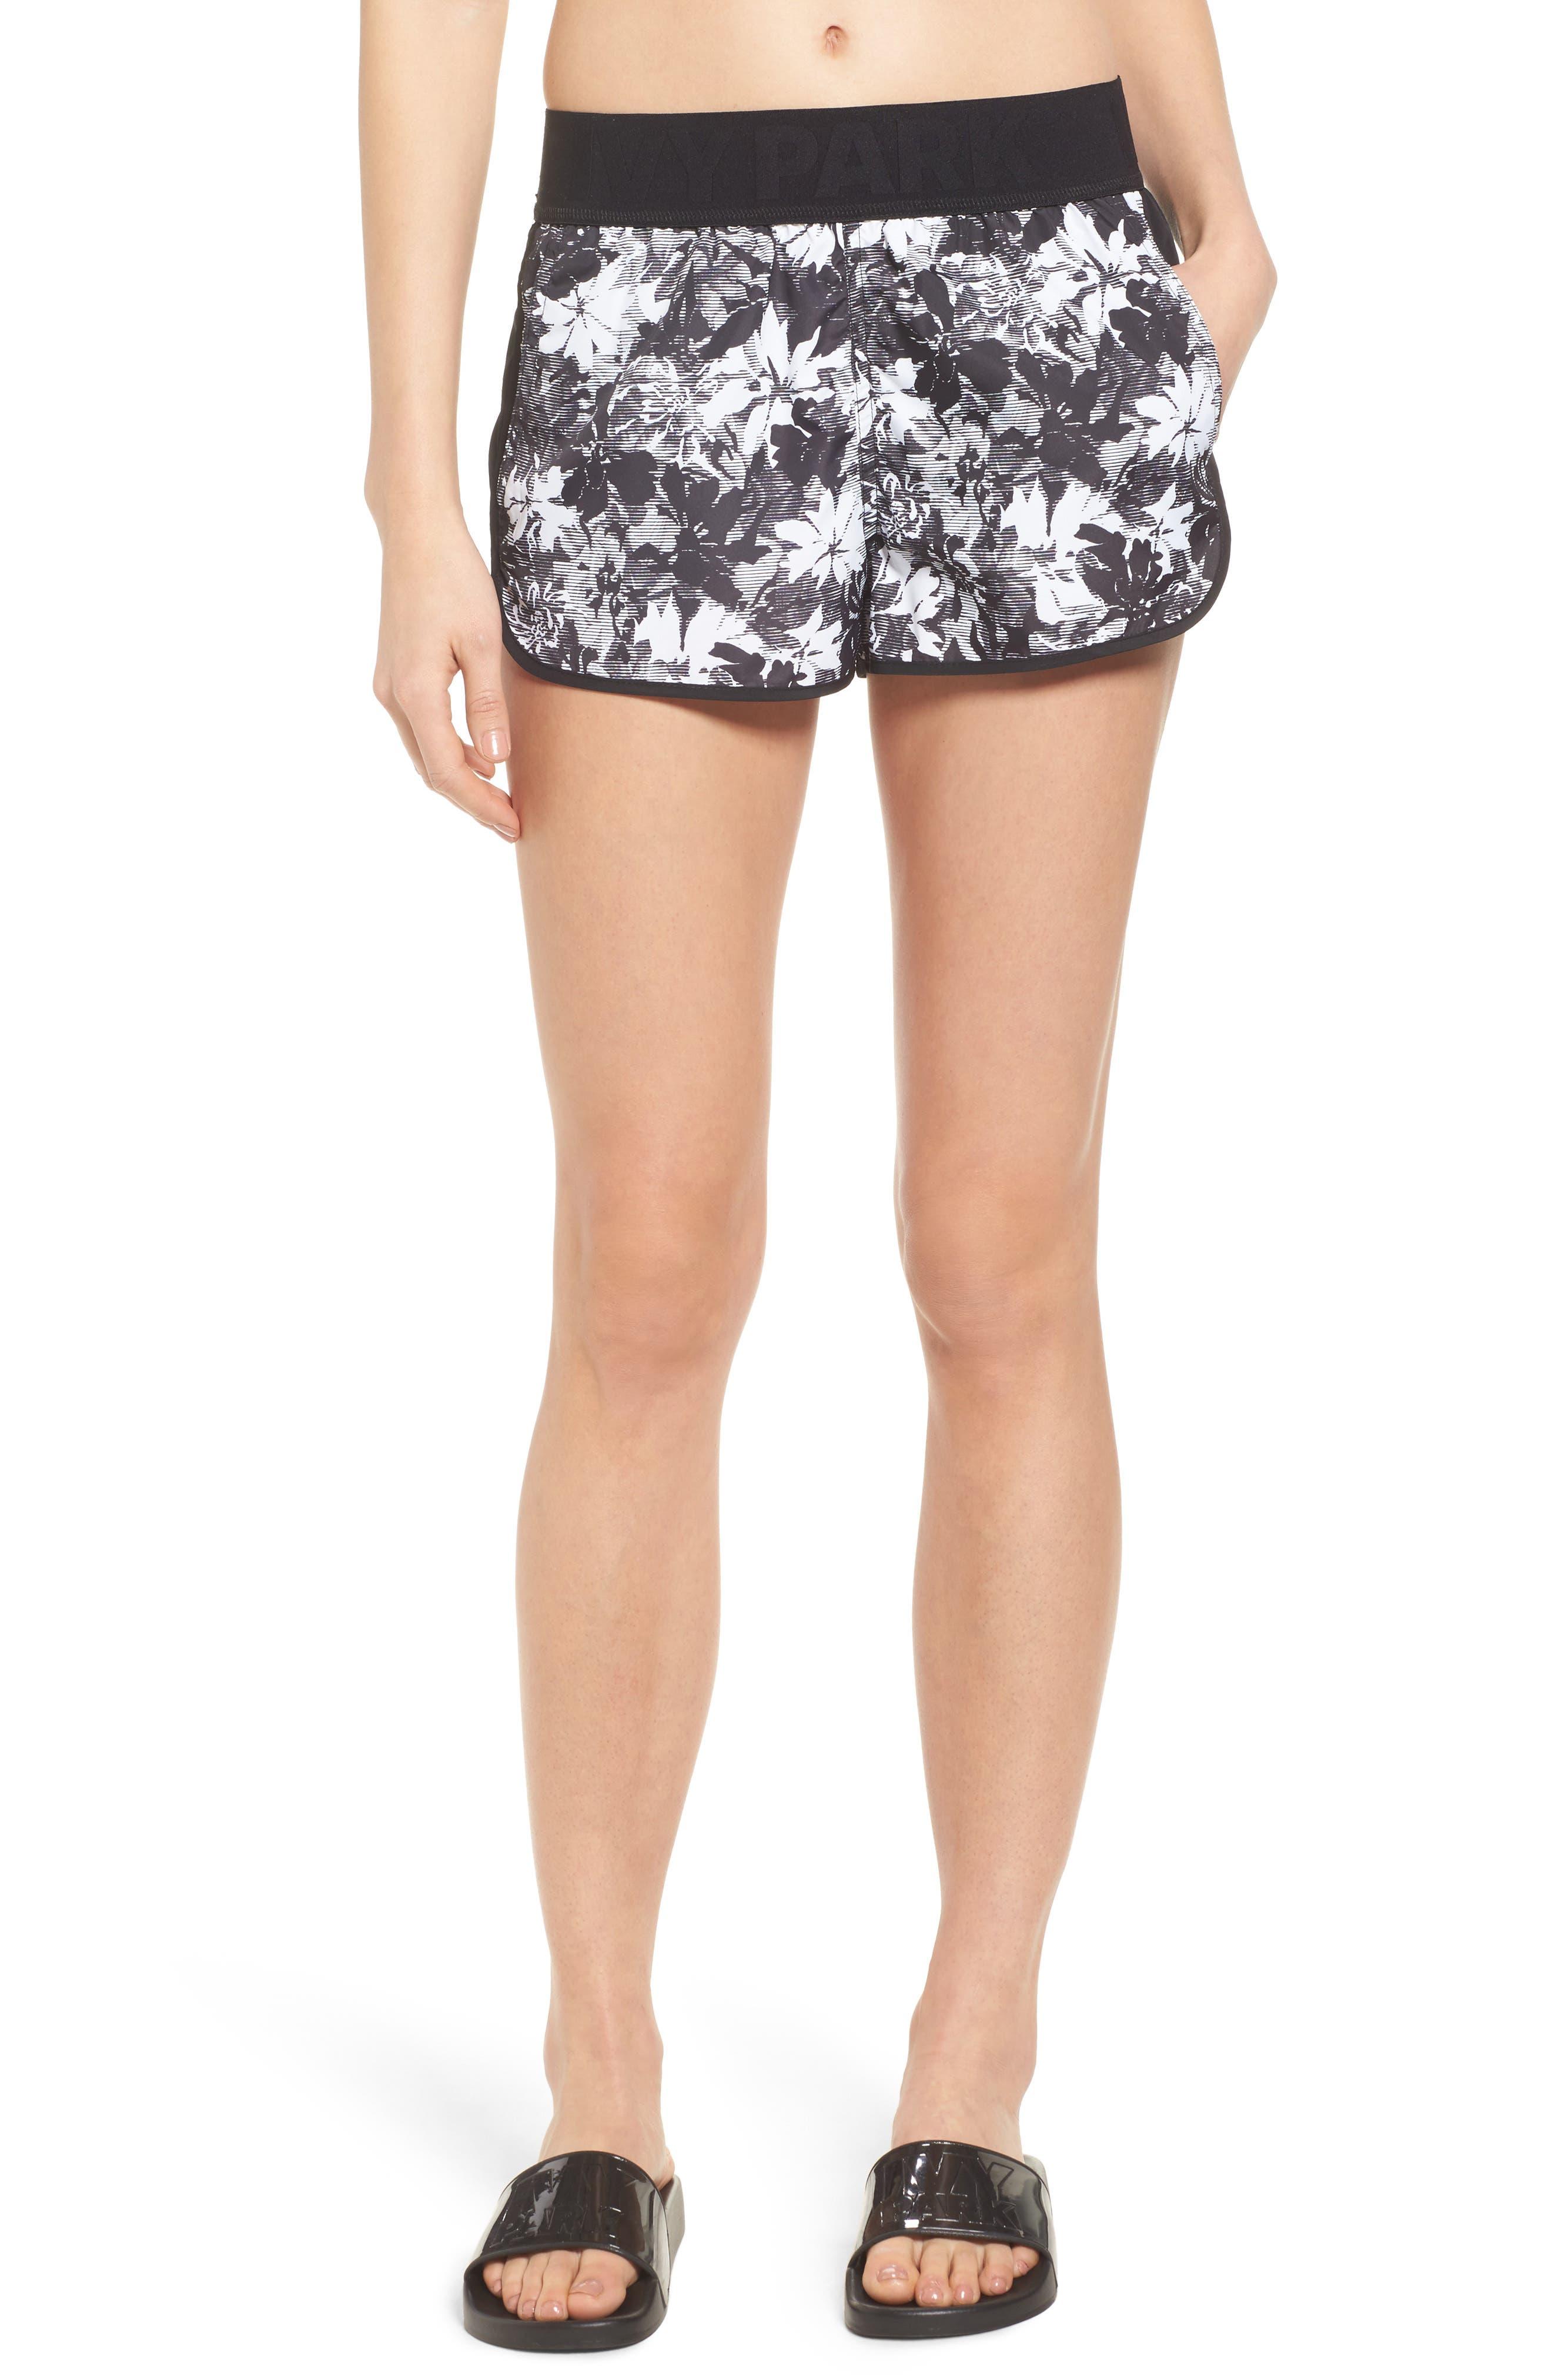 IVY PARK Floral Running Shorts